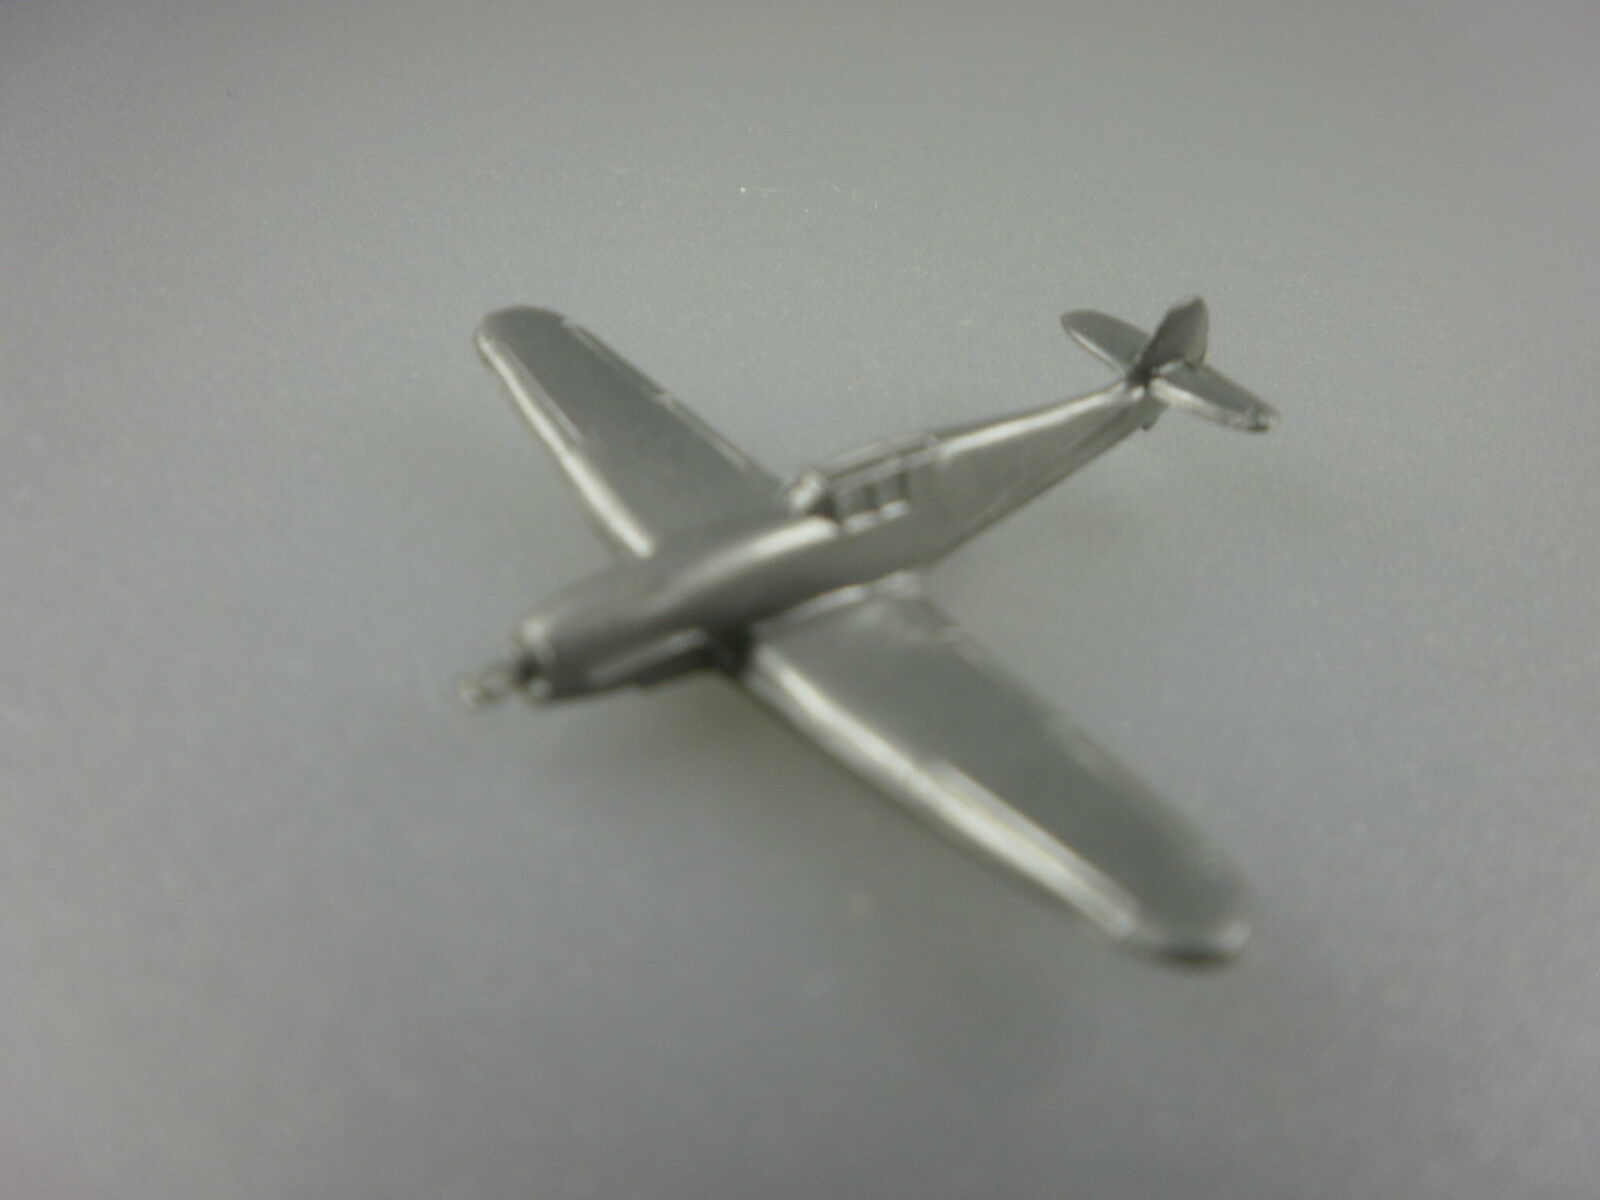 Wiking  avion couteau Schmitt Me 109 F couleur  rohargent  (cisaillement 1)